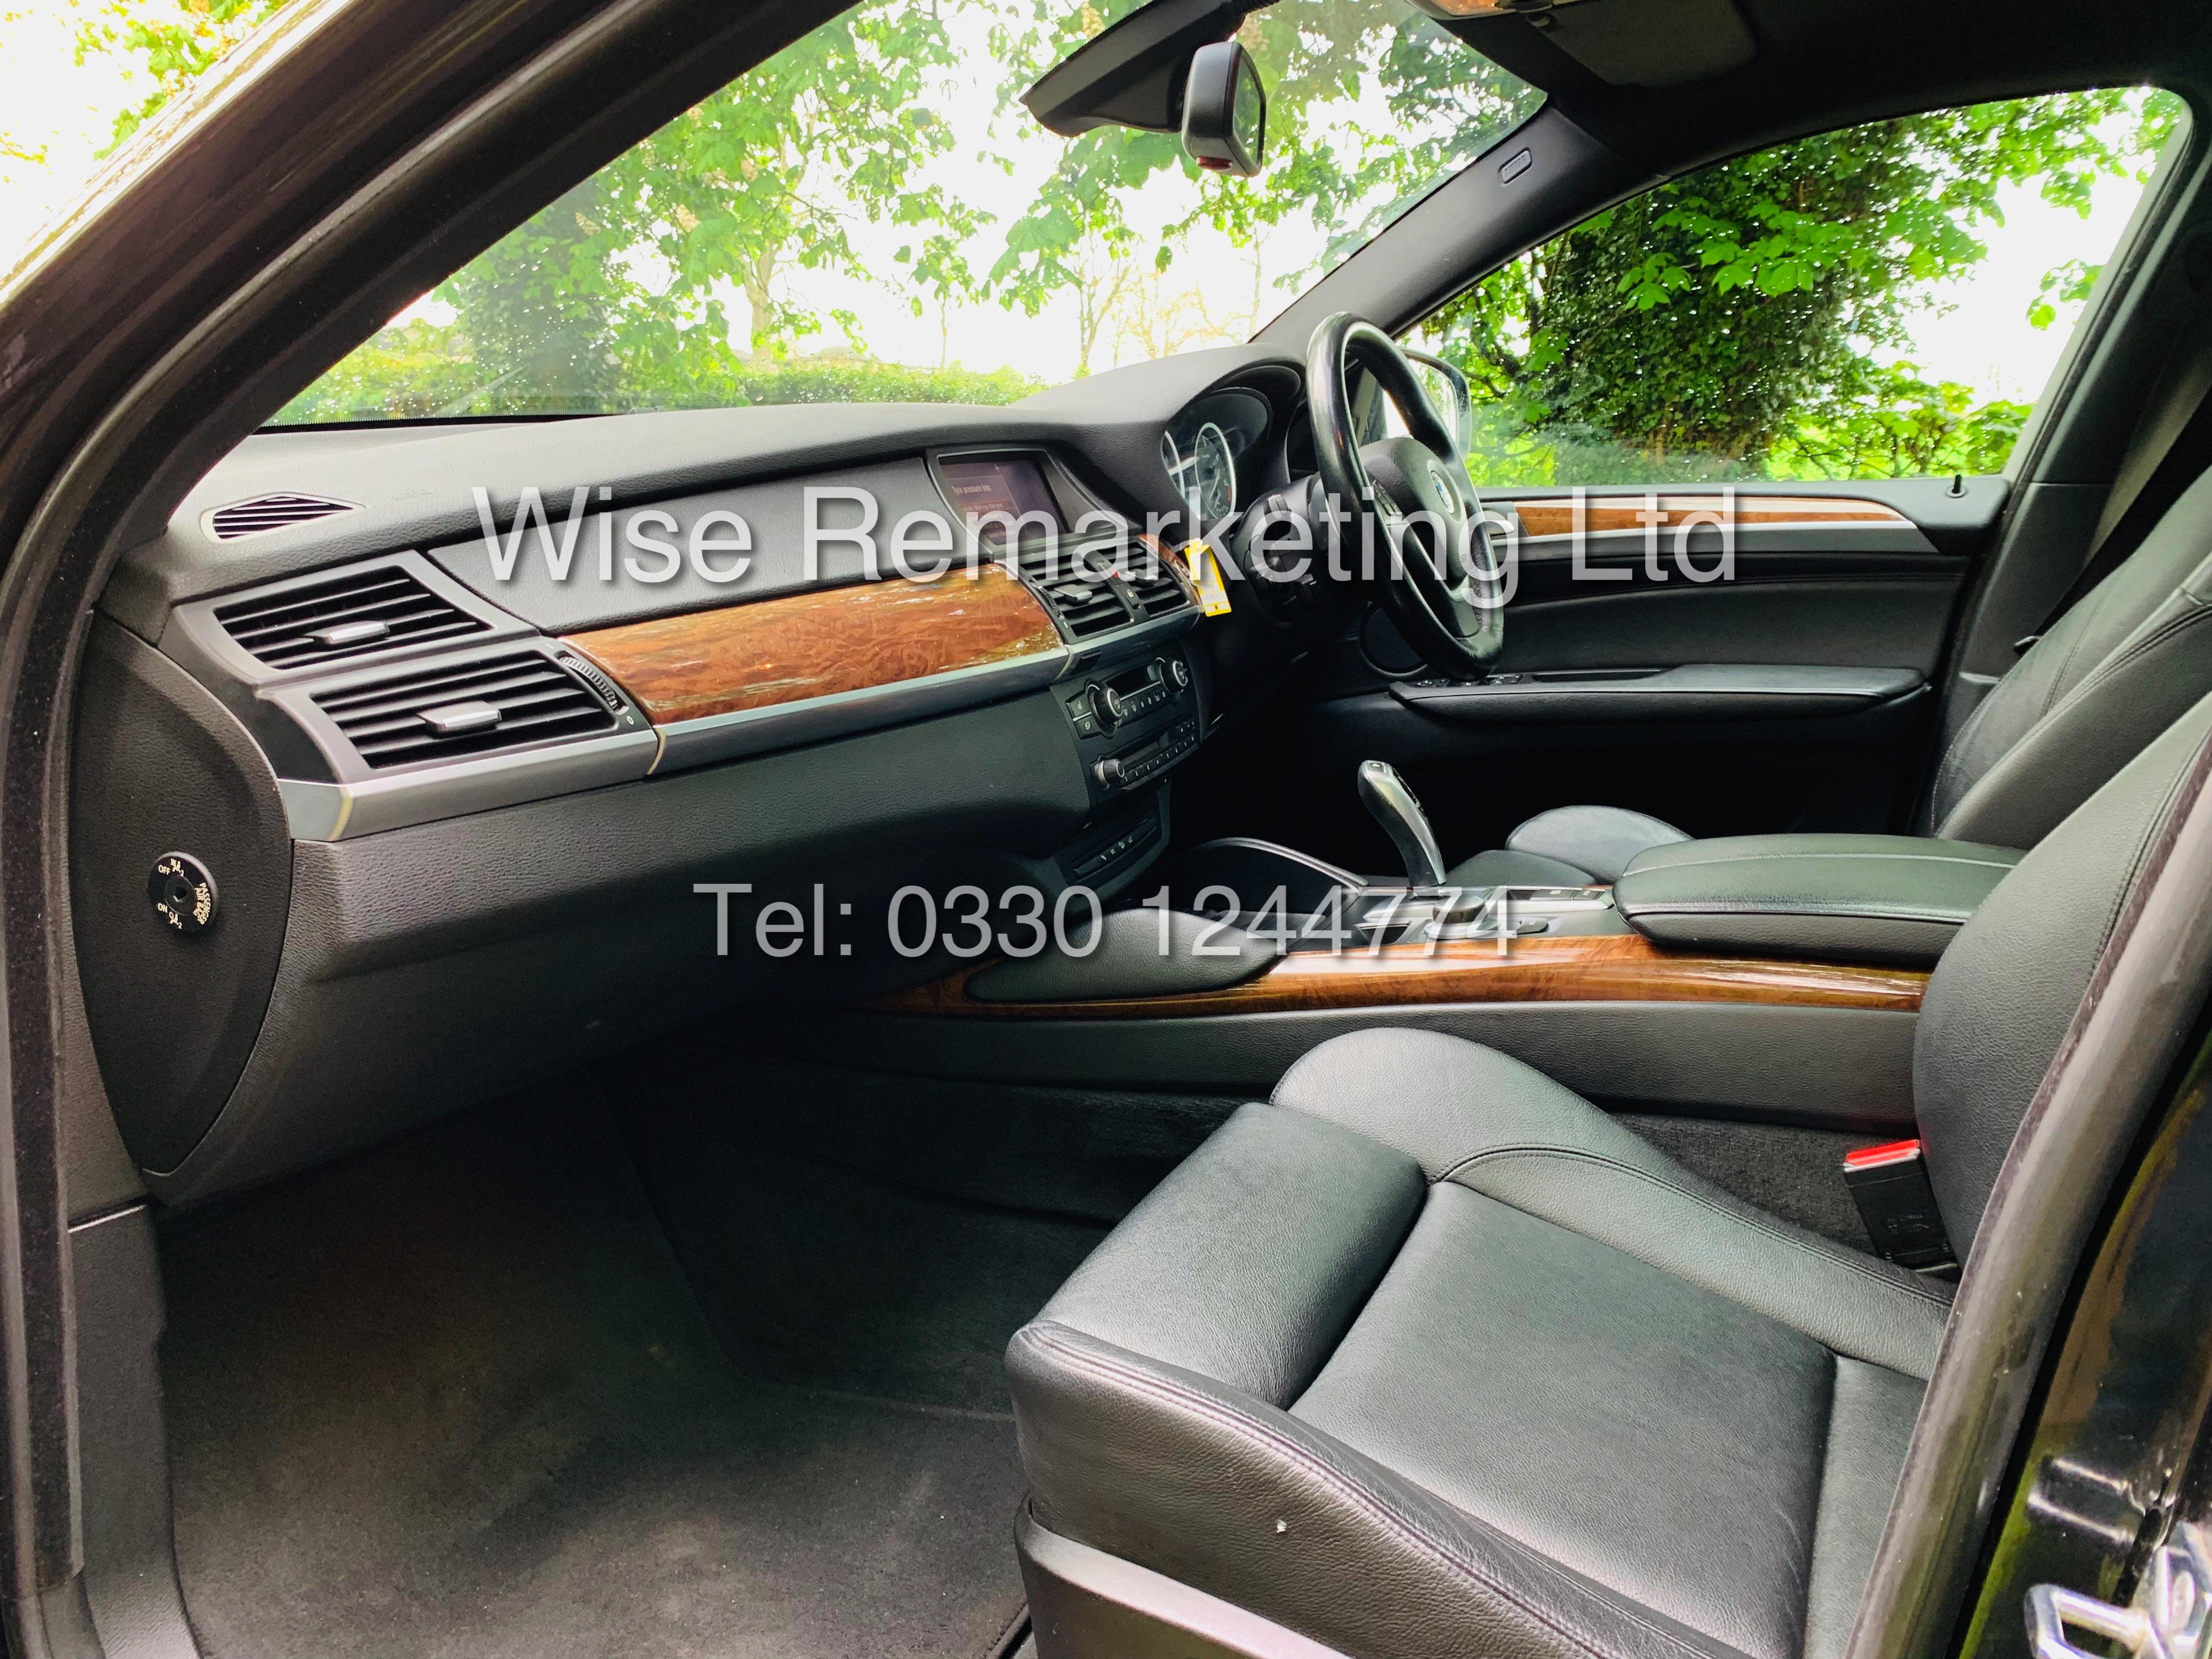 BMW X6 XDRIVE 35D AUTO (2009 SPEC) *1 PREVIOUS OWNER* PARKING AID - SAT NAV - FSH - Image 12 of 25